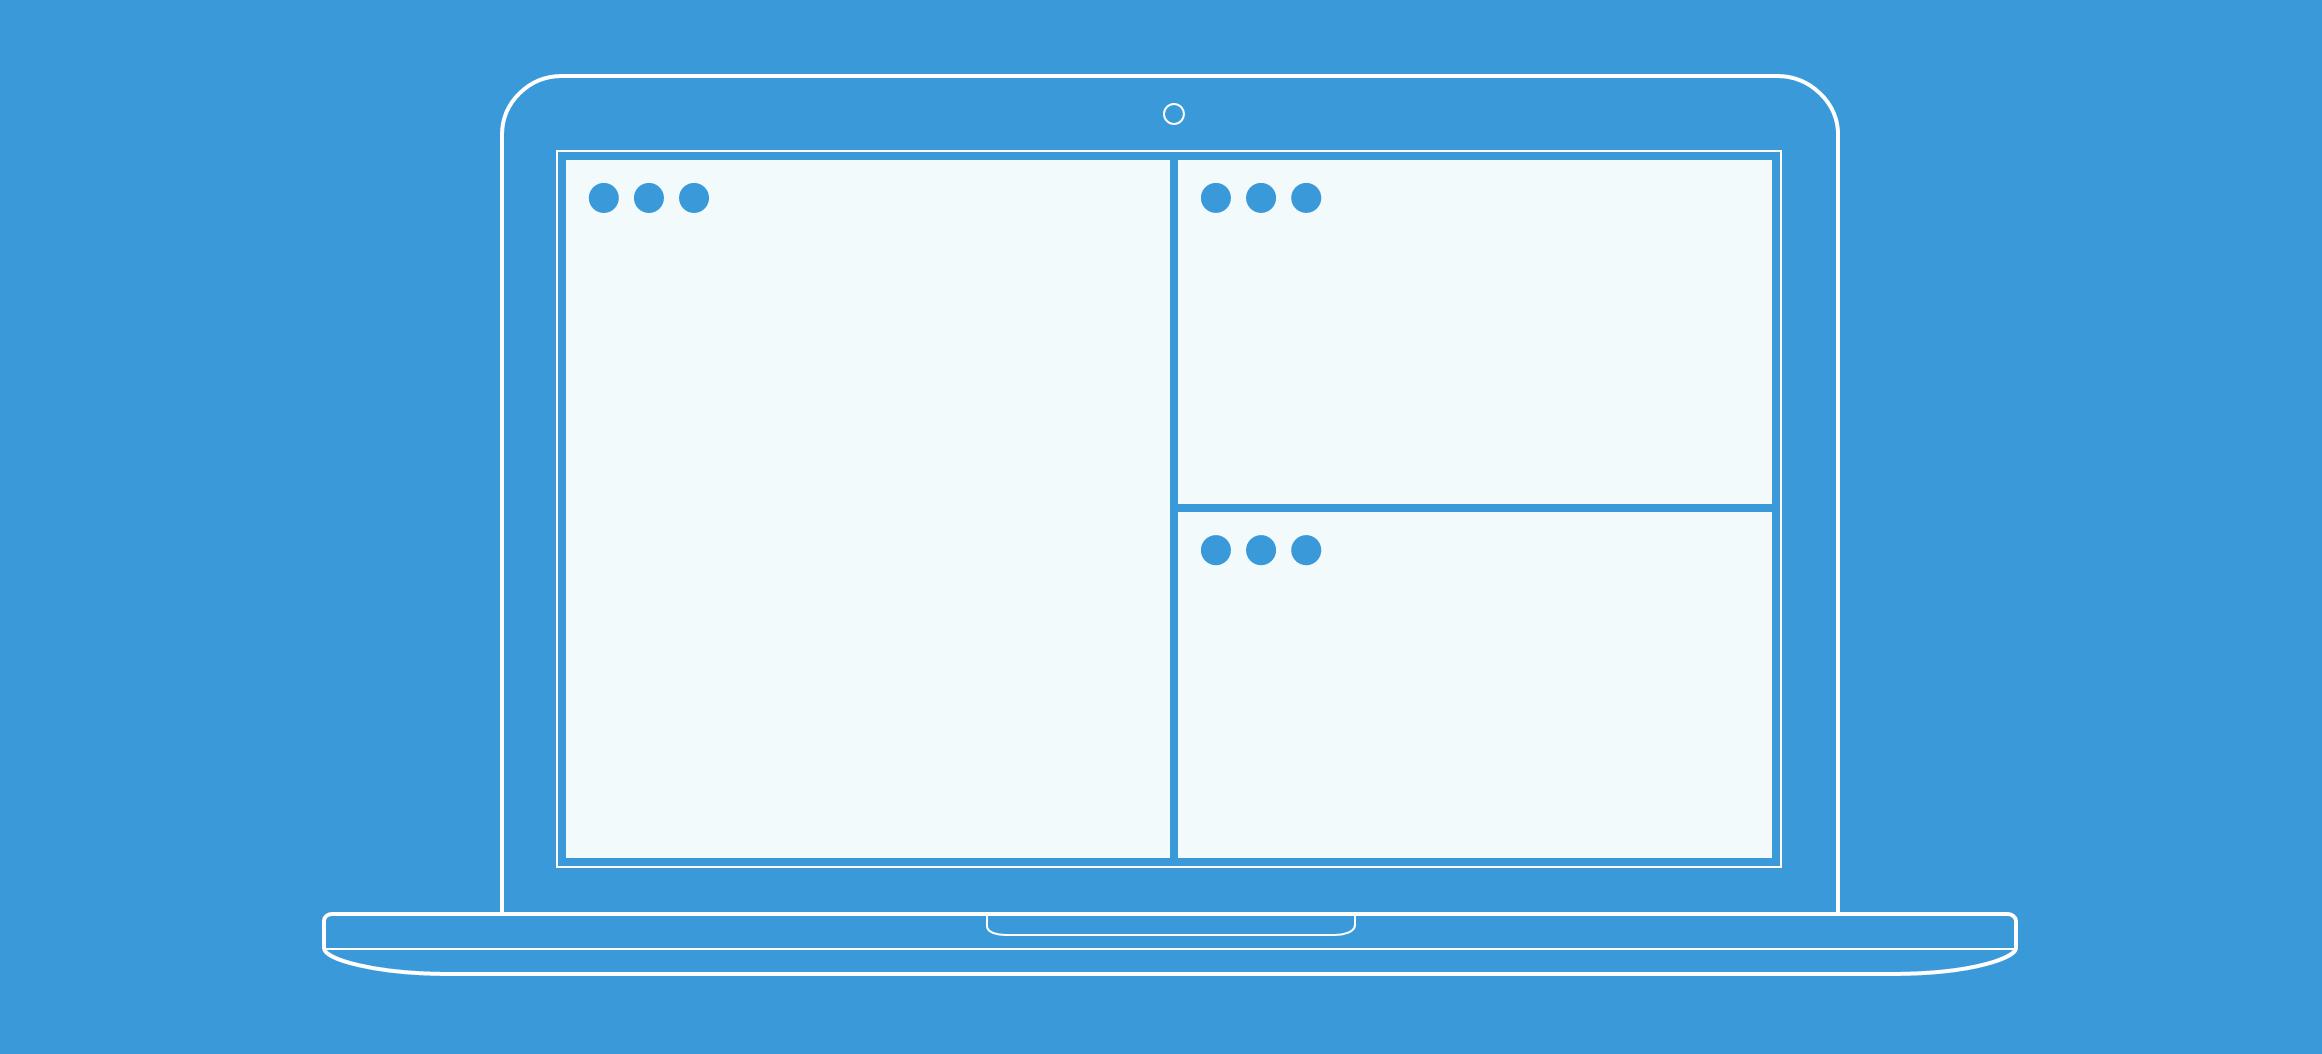 magnet-organizar-ventanas-apps-mac-oferta